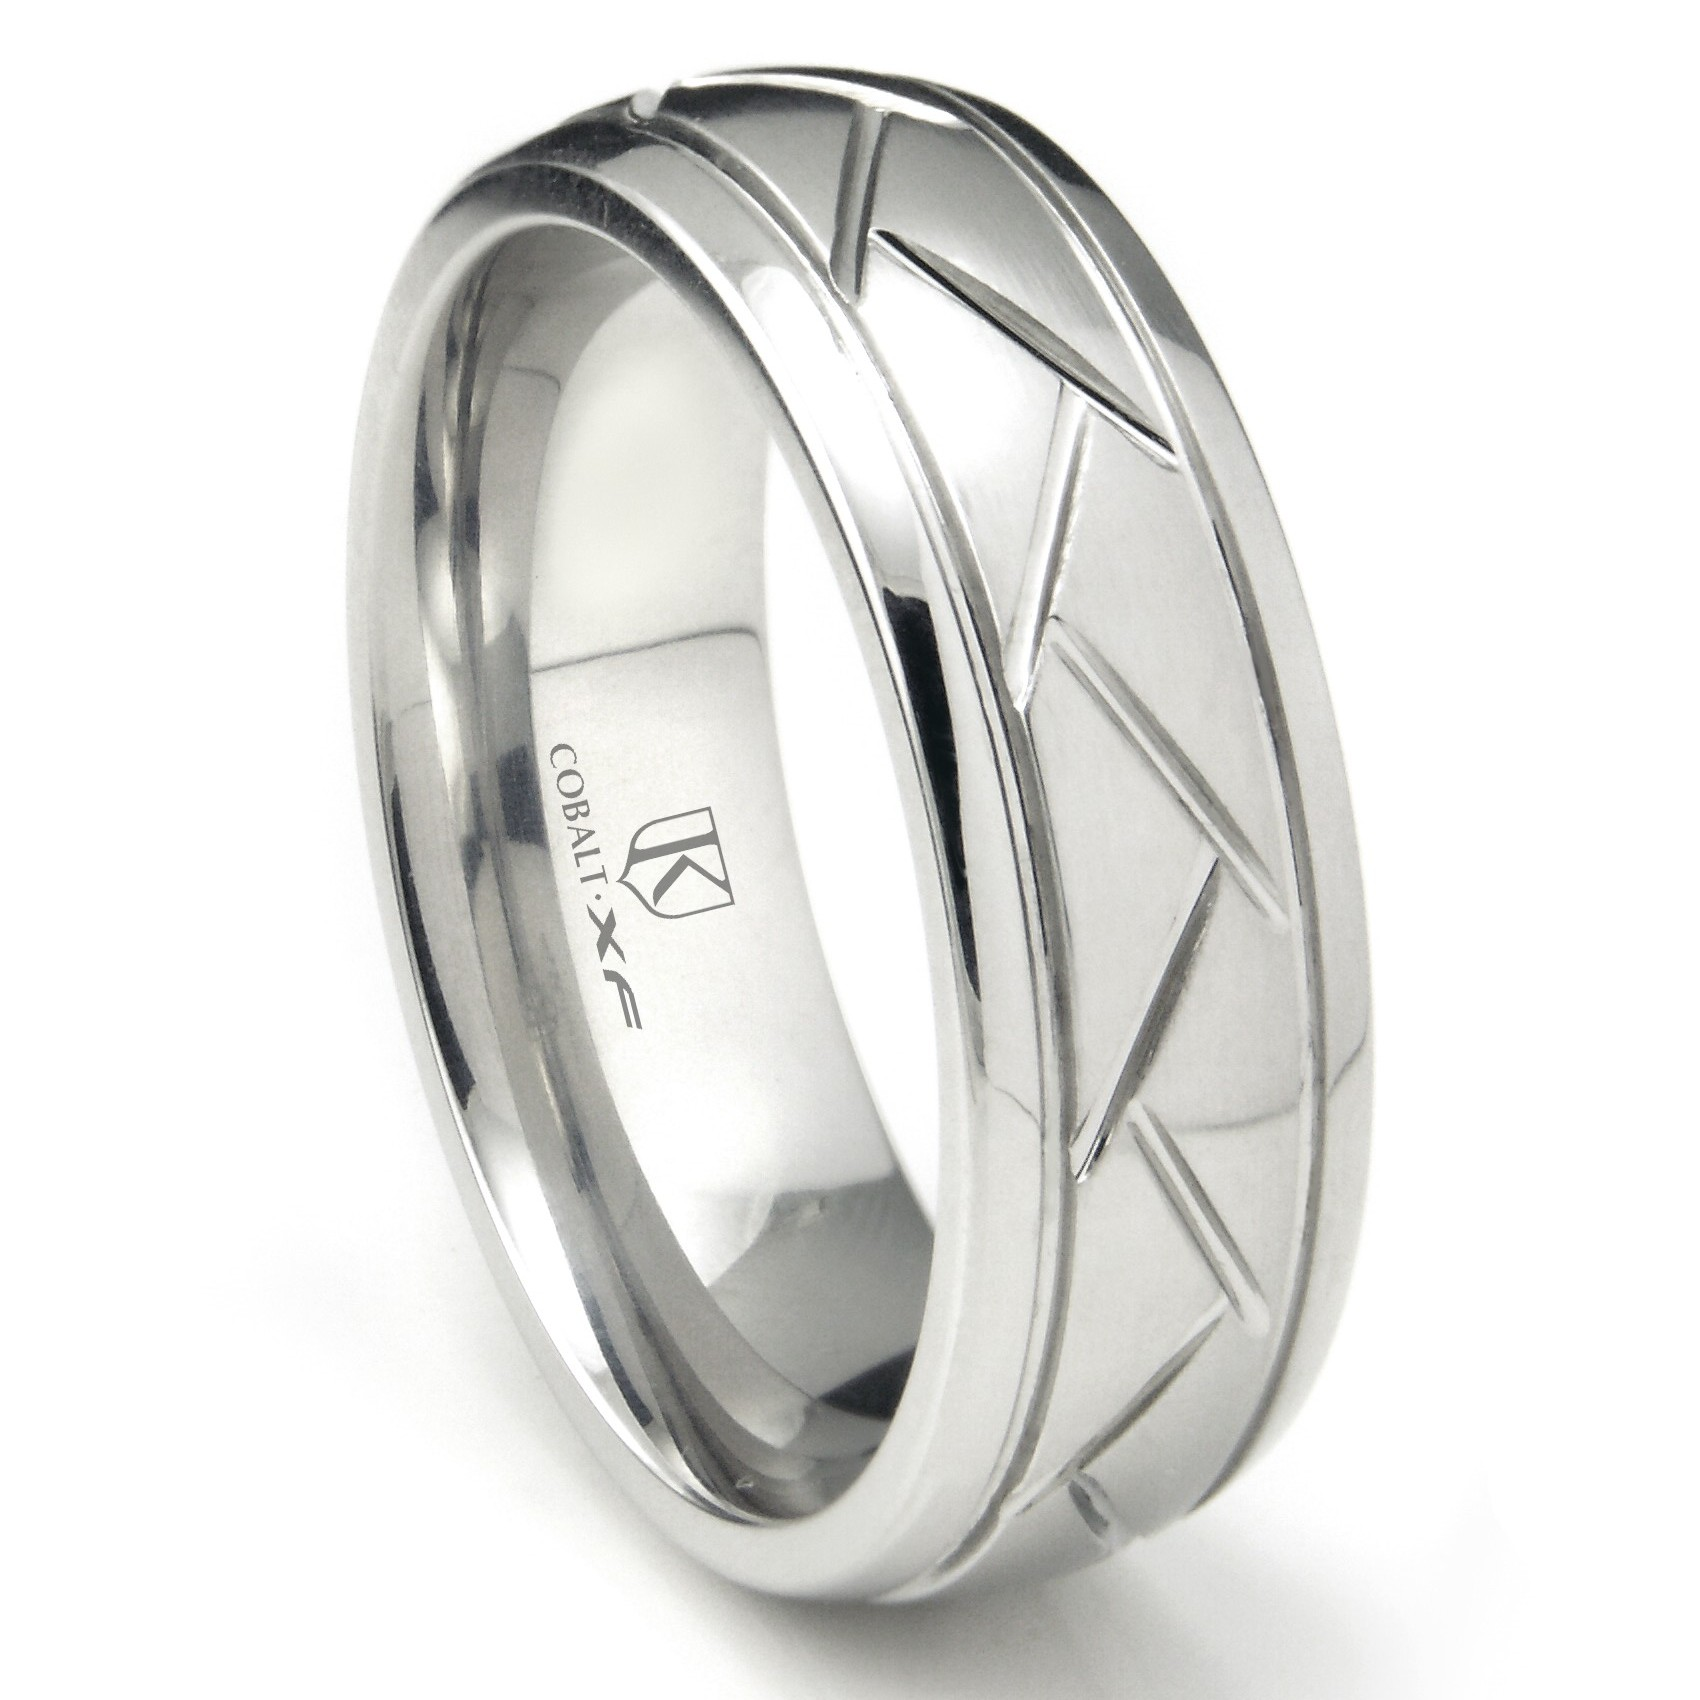 cobalt xf chrome 8mm diamond cut newport wedding band ring